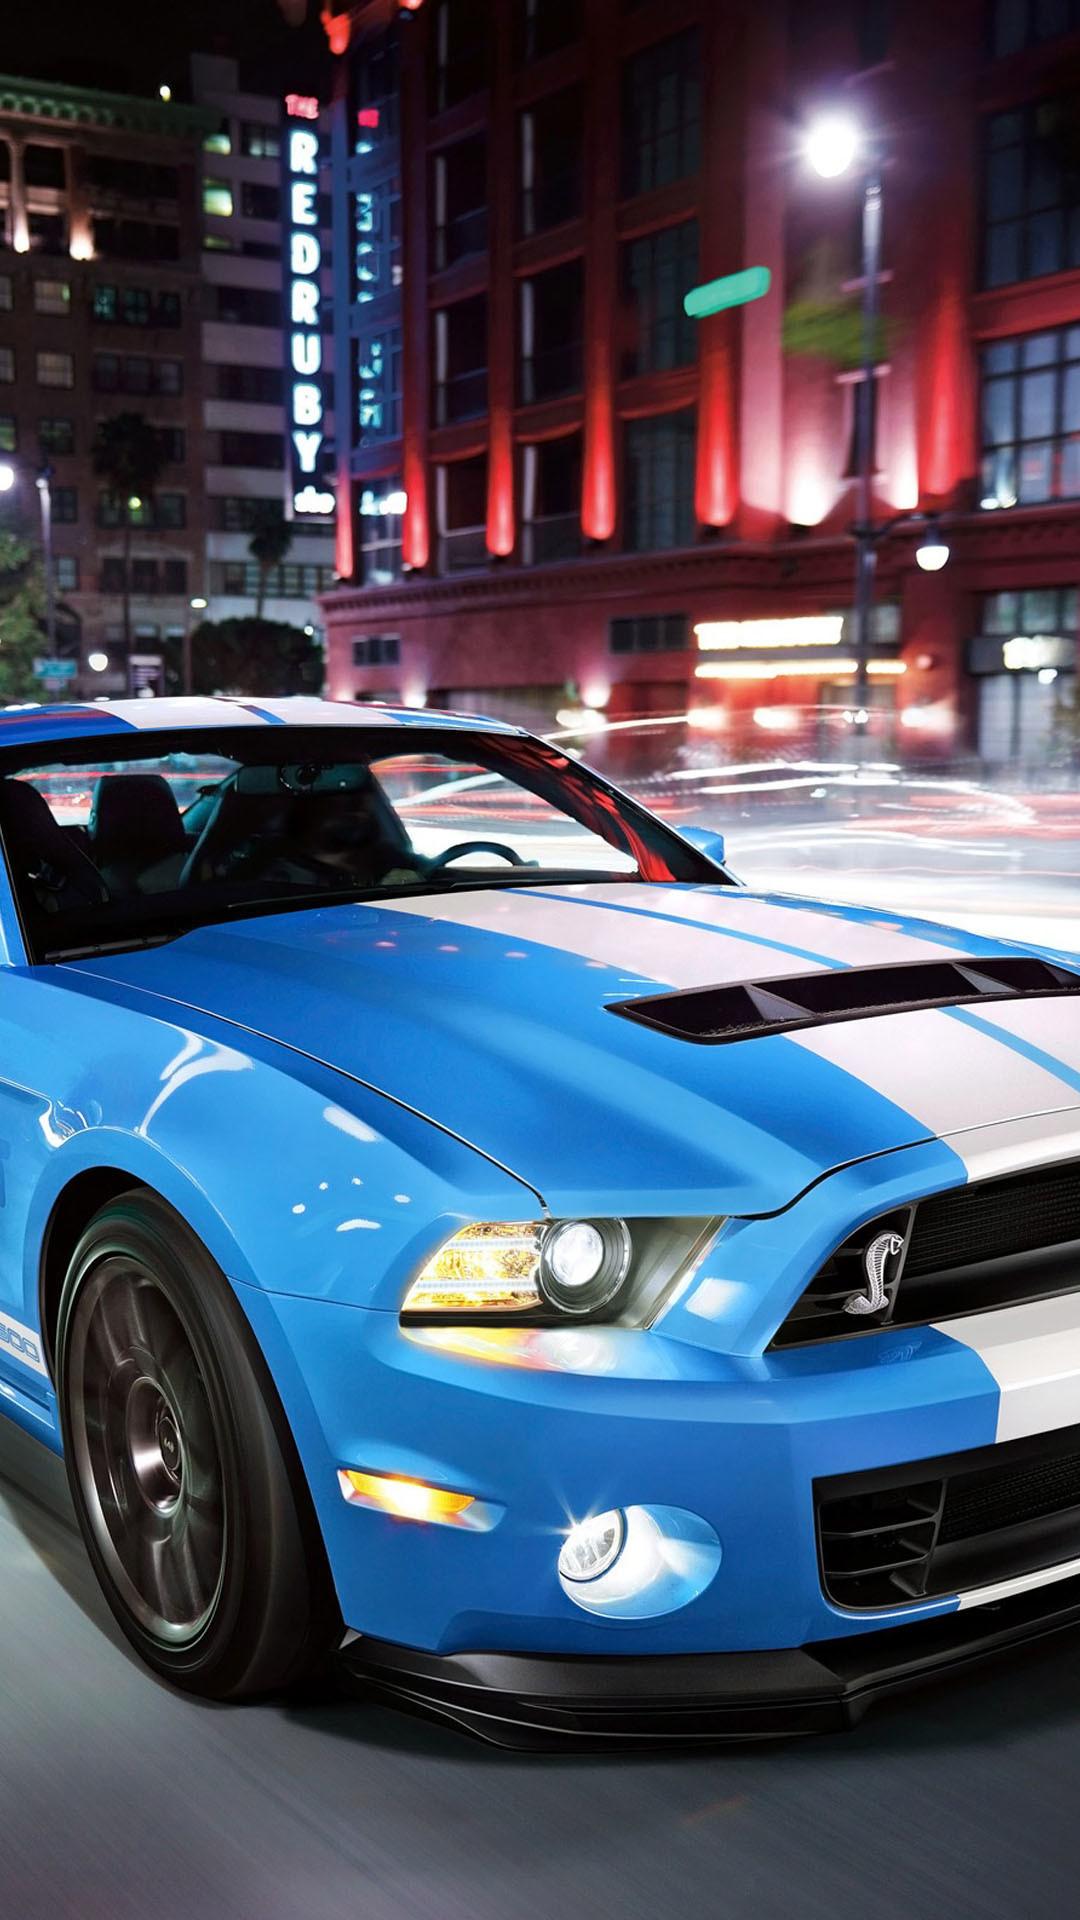 Light Blue Ford Shelby Sport Car